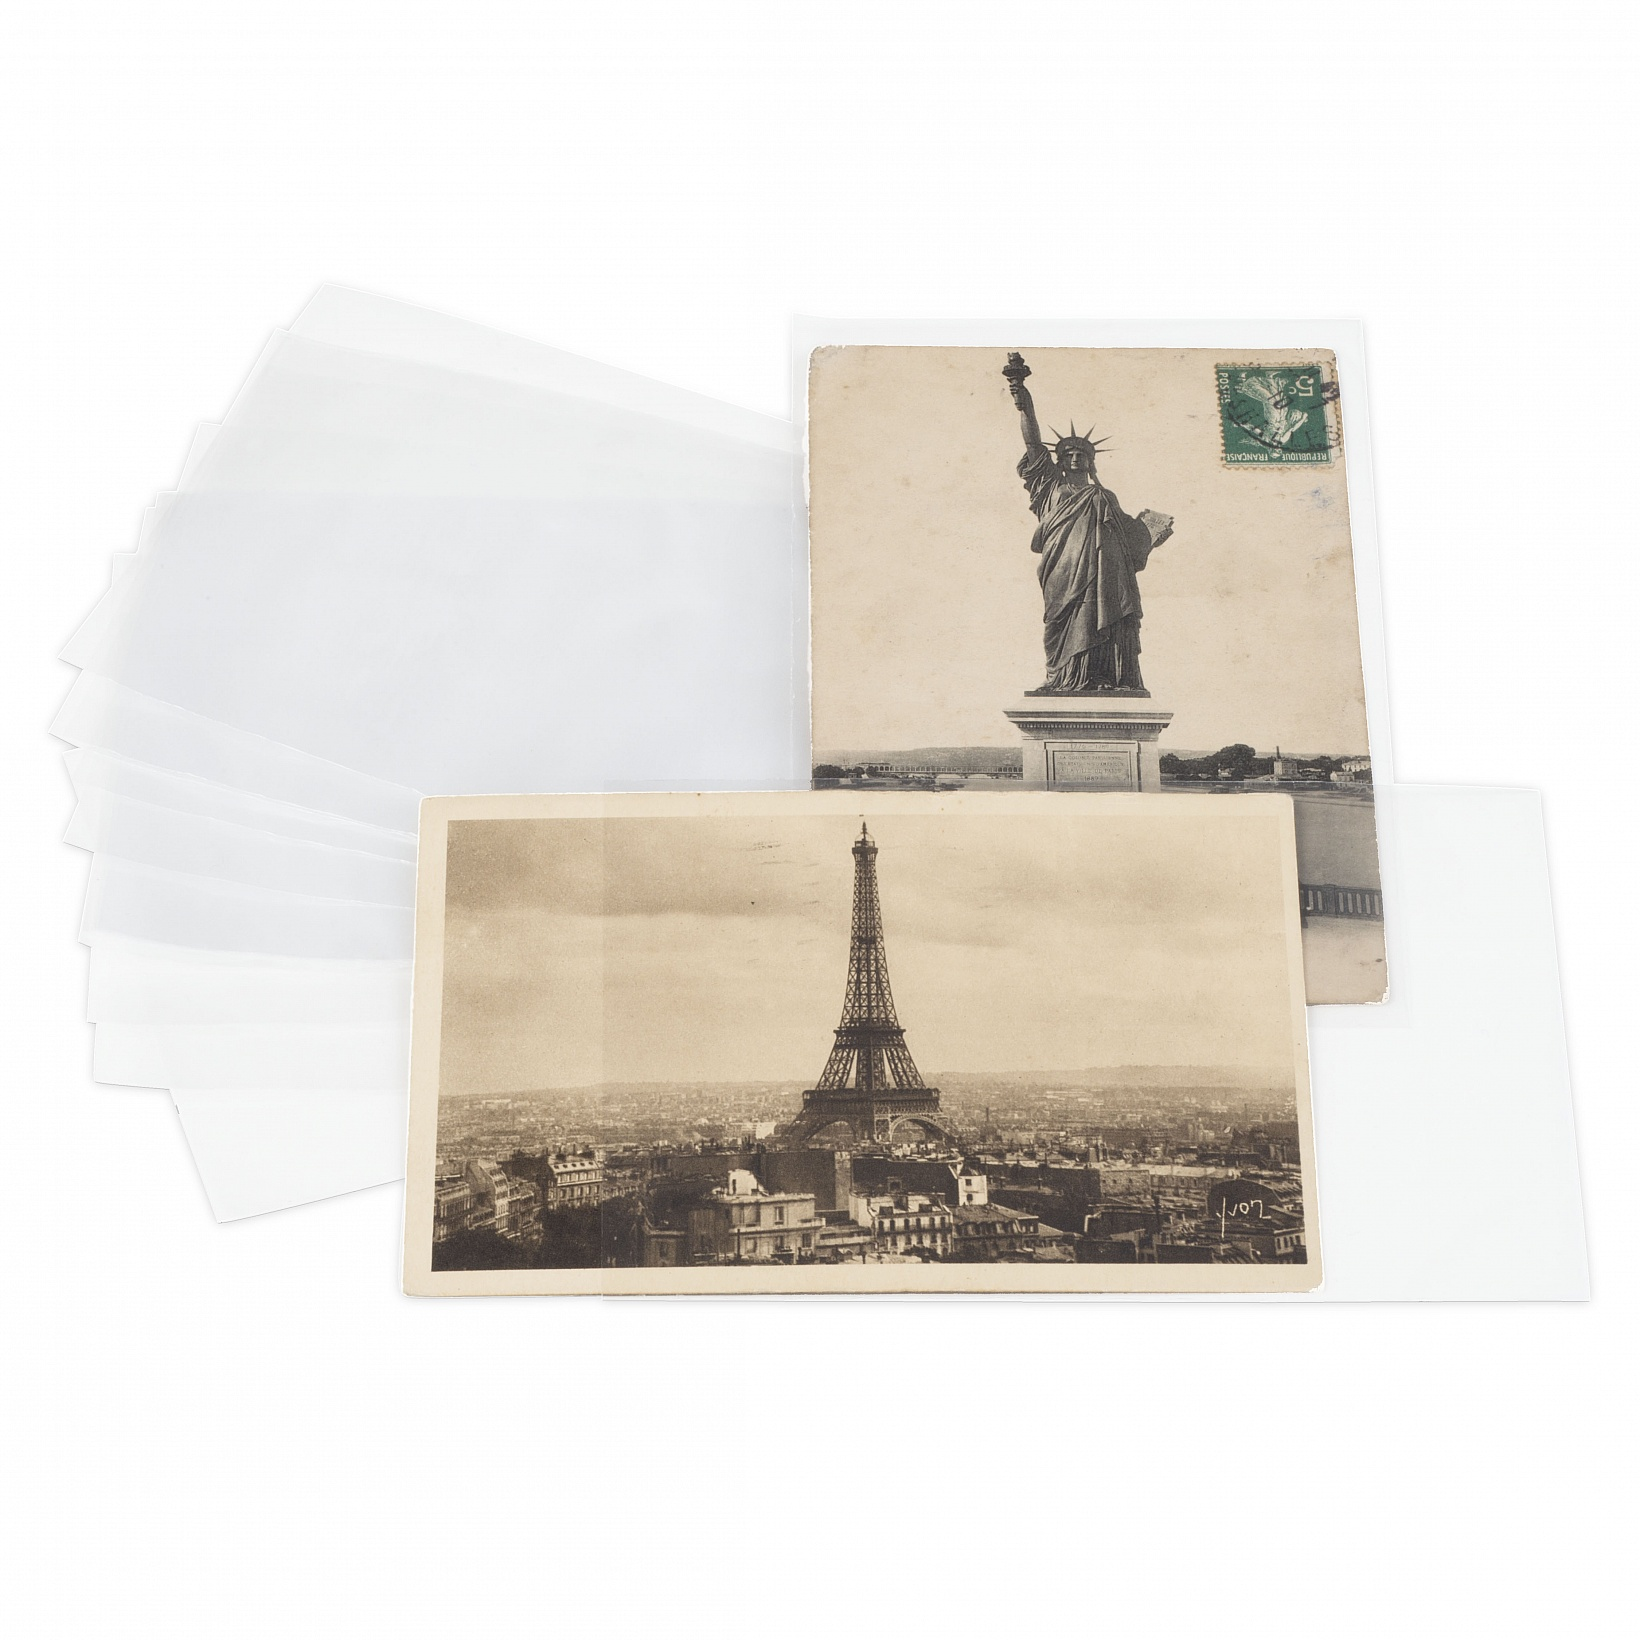 LEUCHTTURM пленка ЗАЩИТНЫЕ на открытки 170x120mm